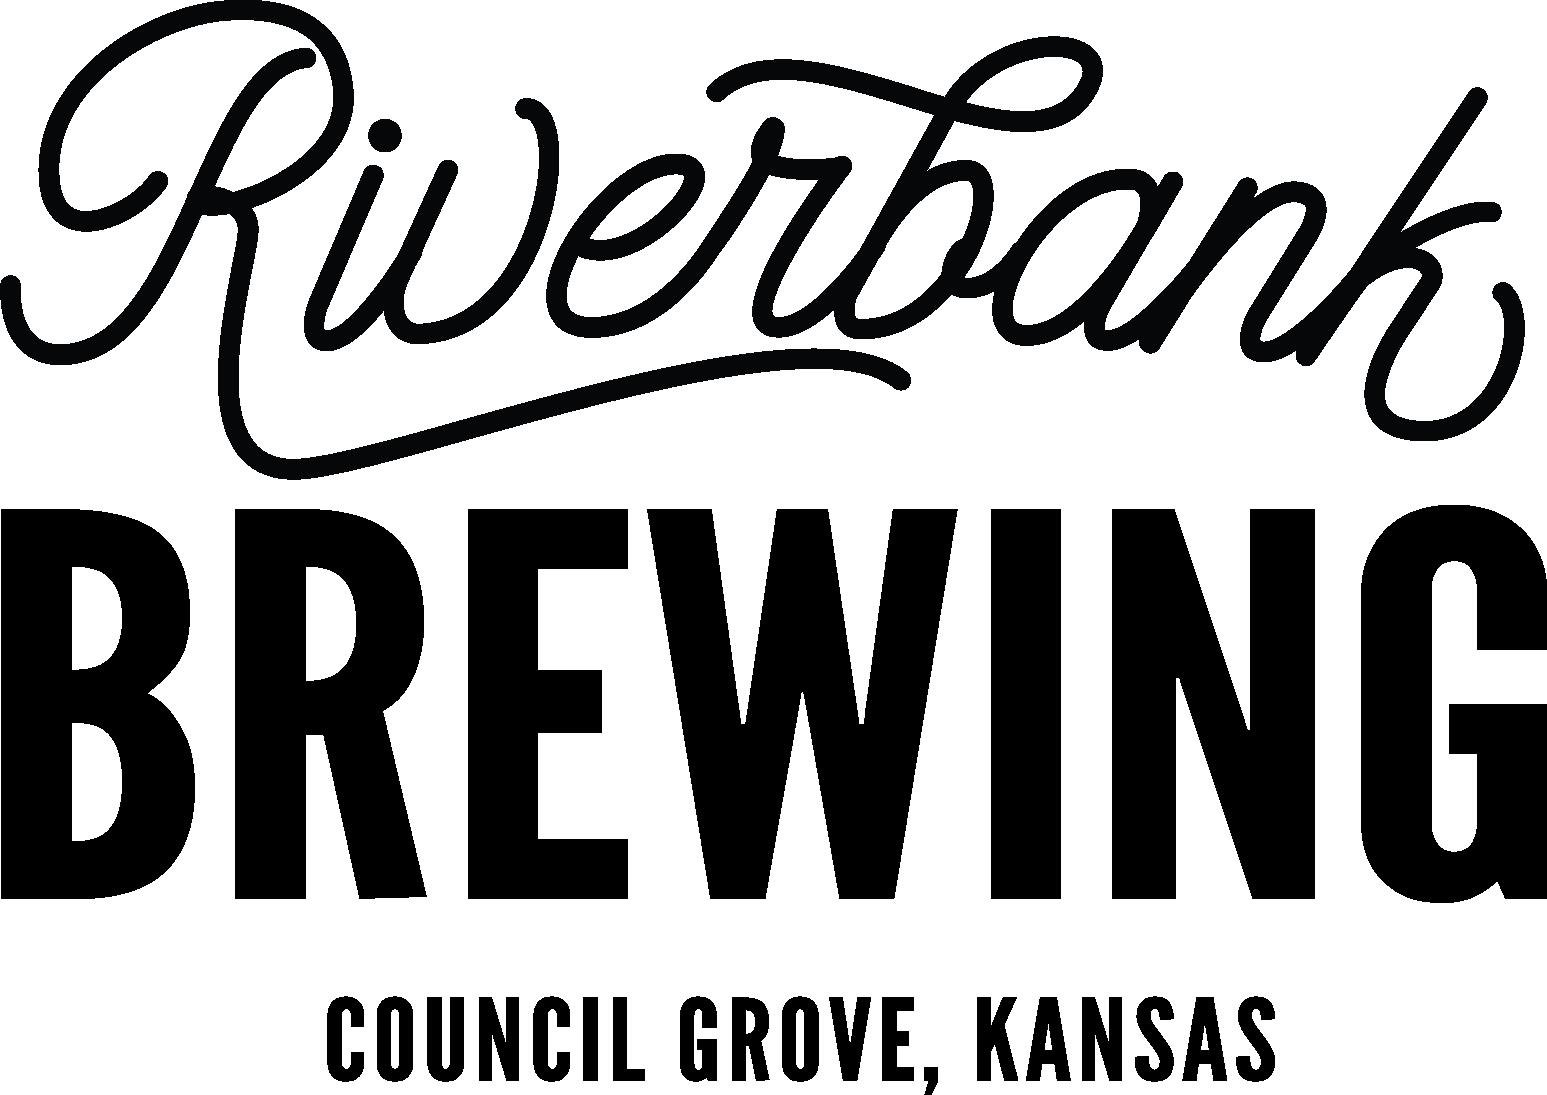 Riverbank Brewing